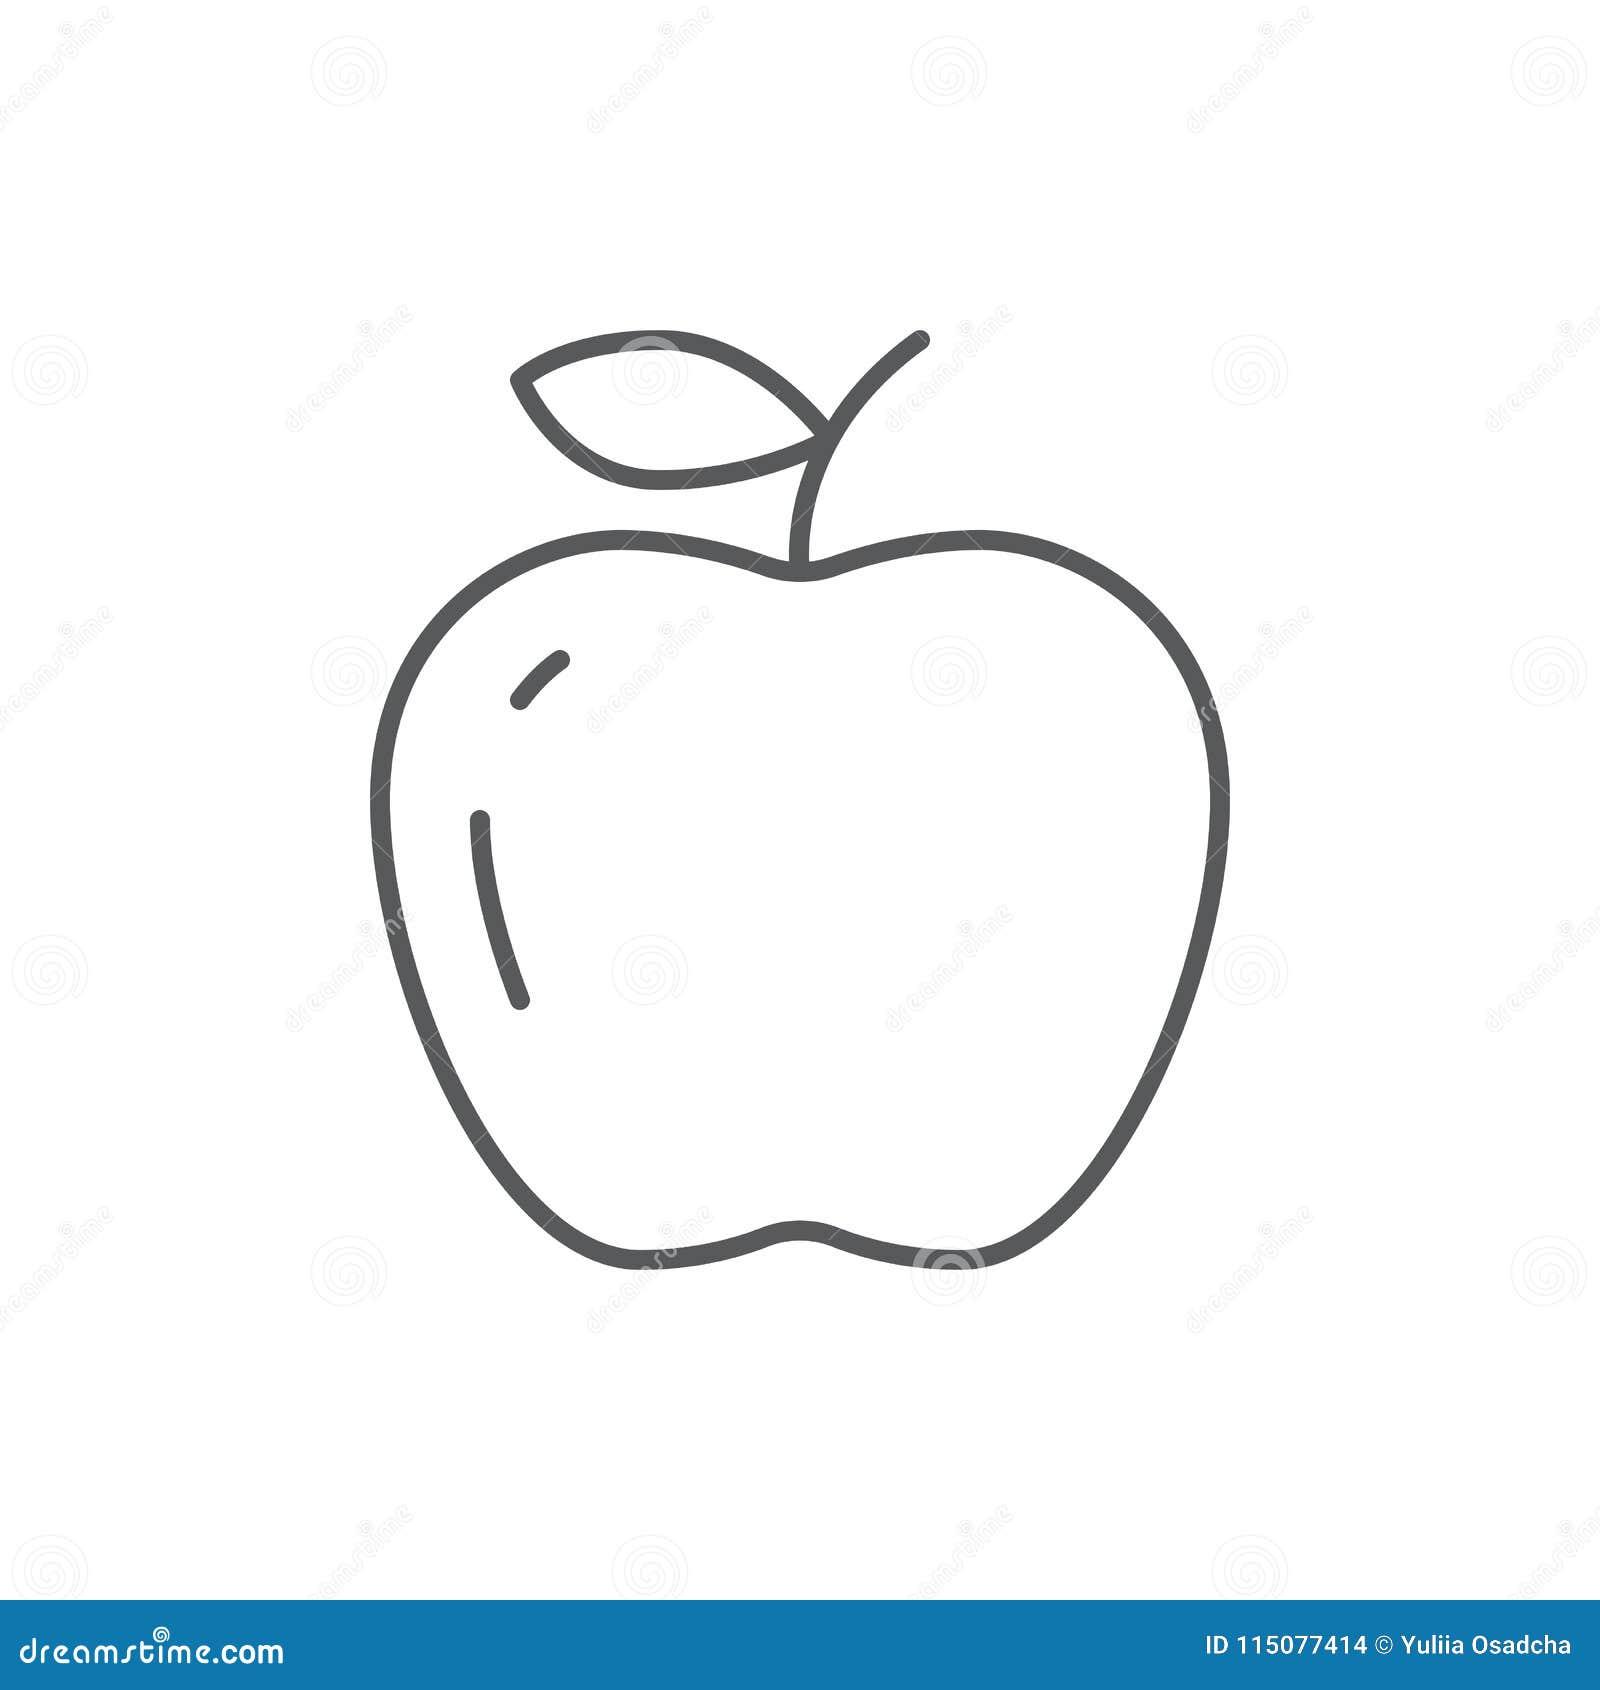 ripe apple editable outline icon pixel perfect symbol of fresh